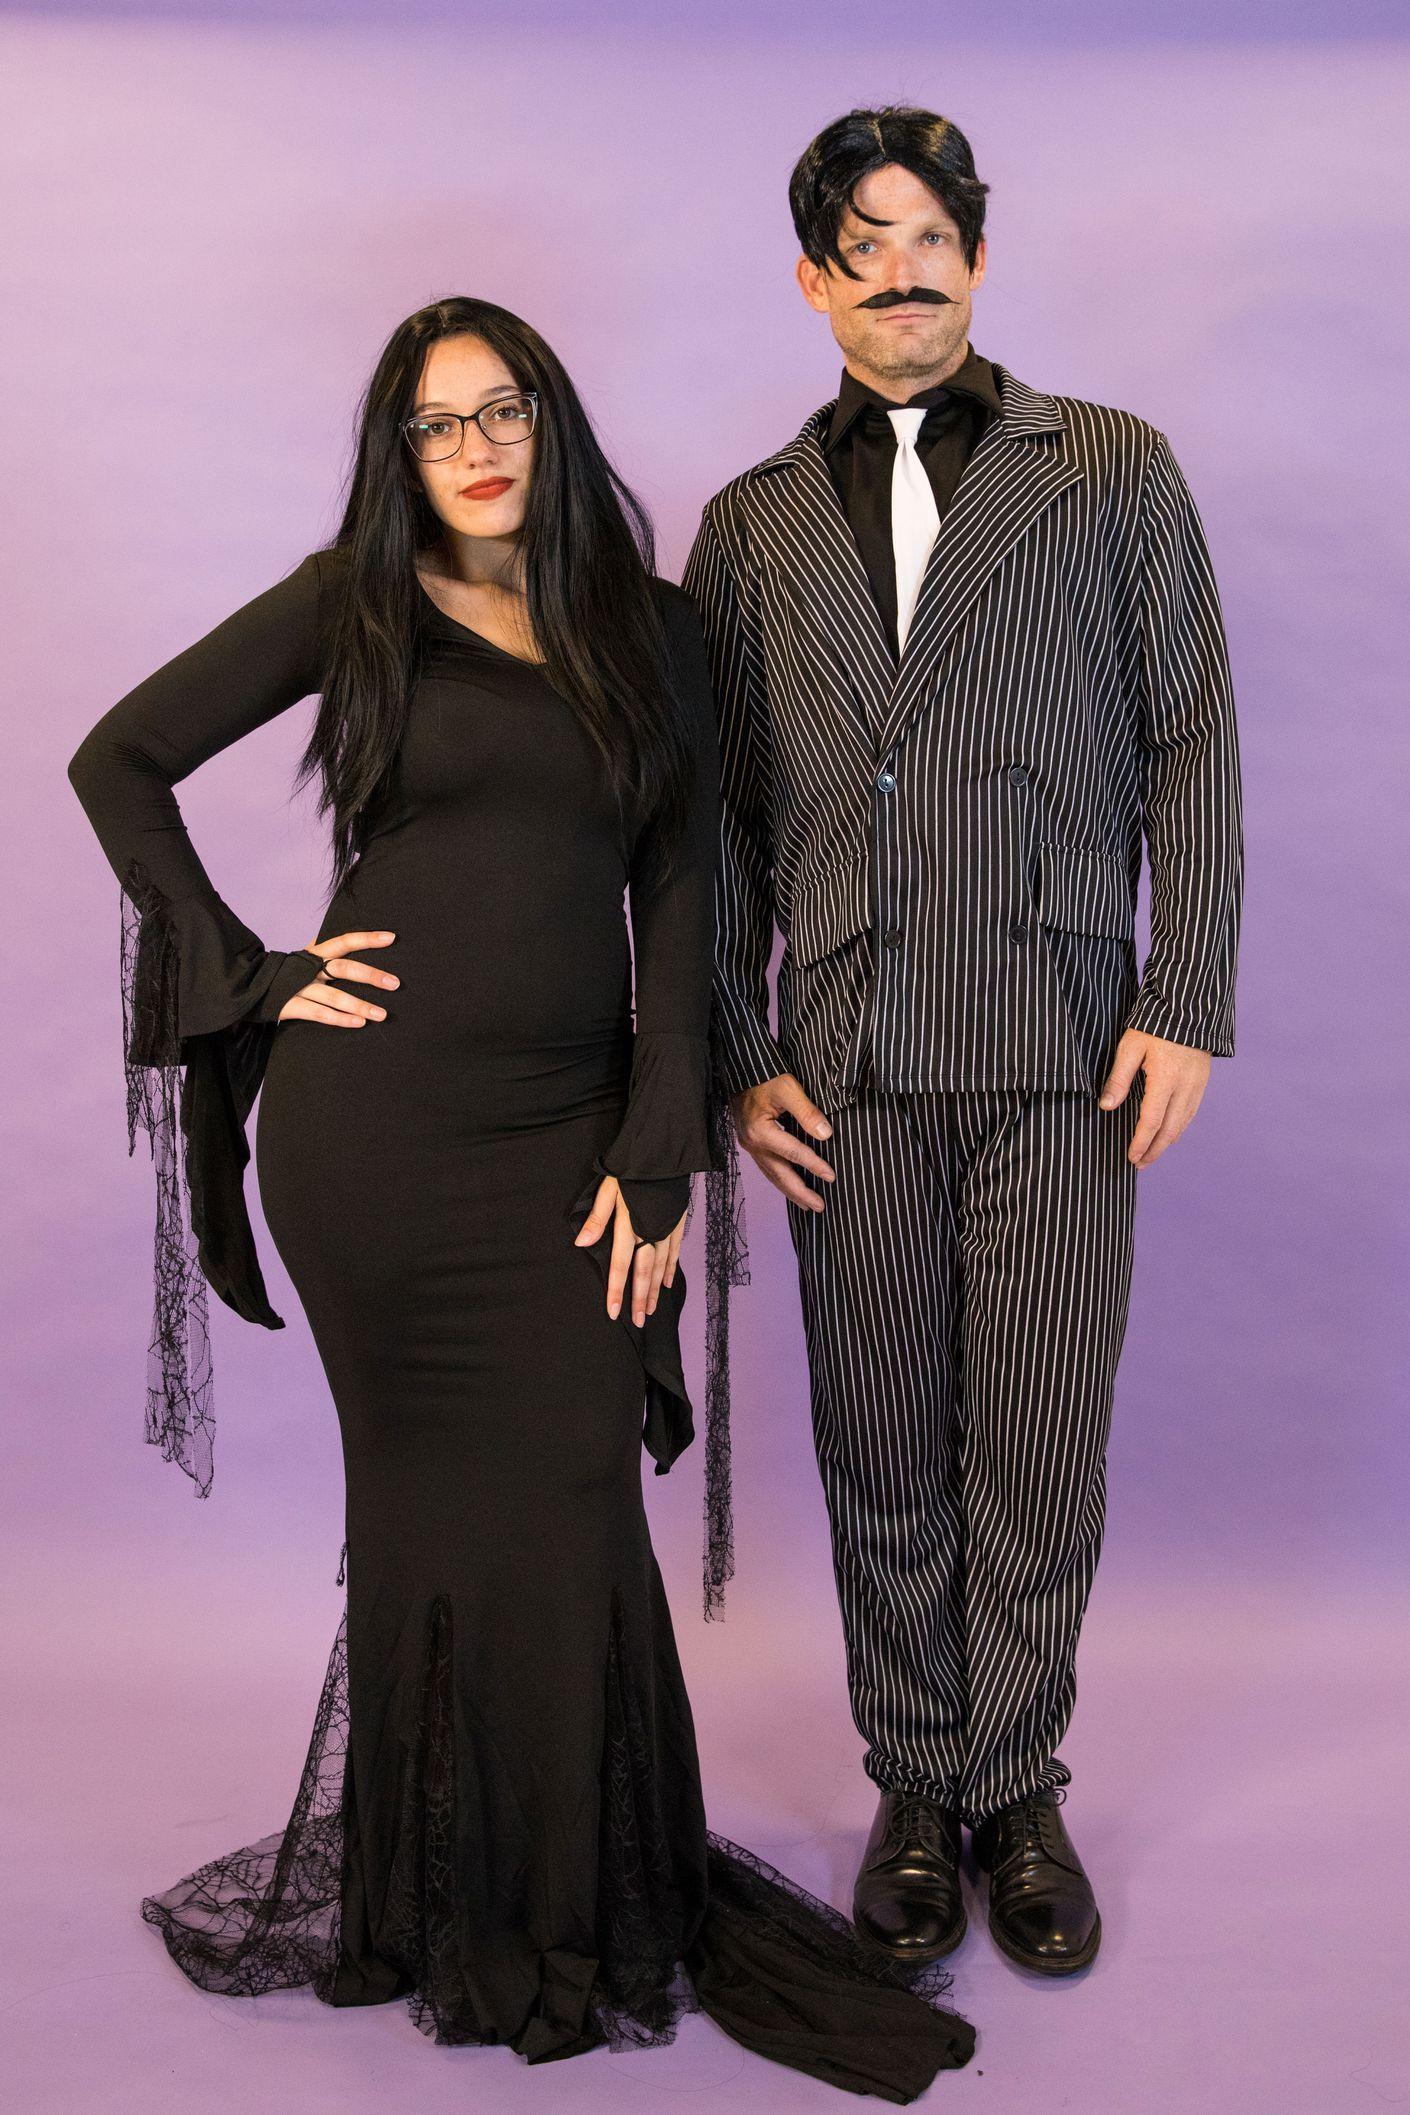 Bacon and Egg Halloween Costumes Cute couple halloween